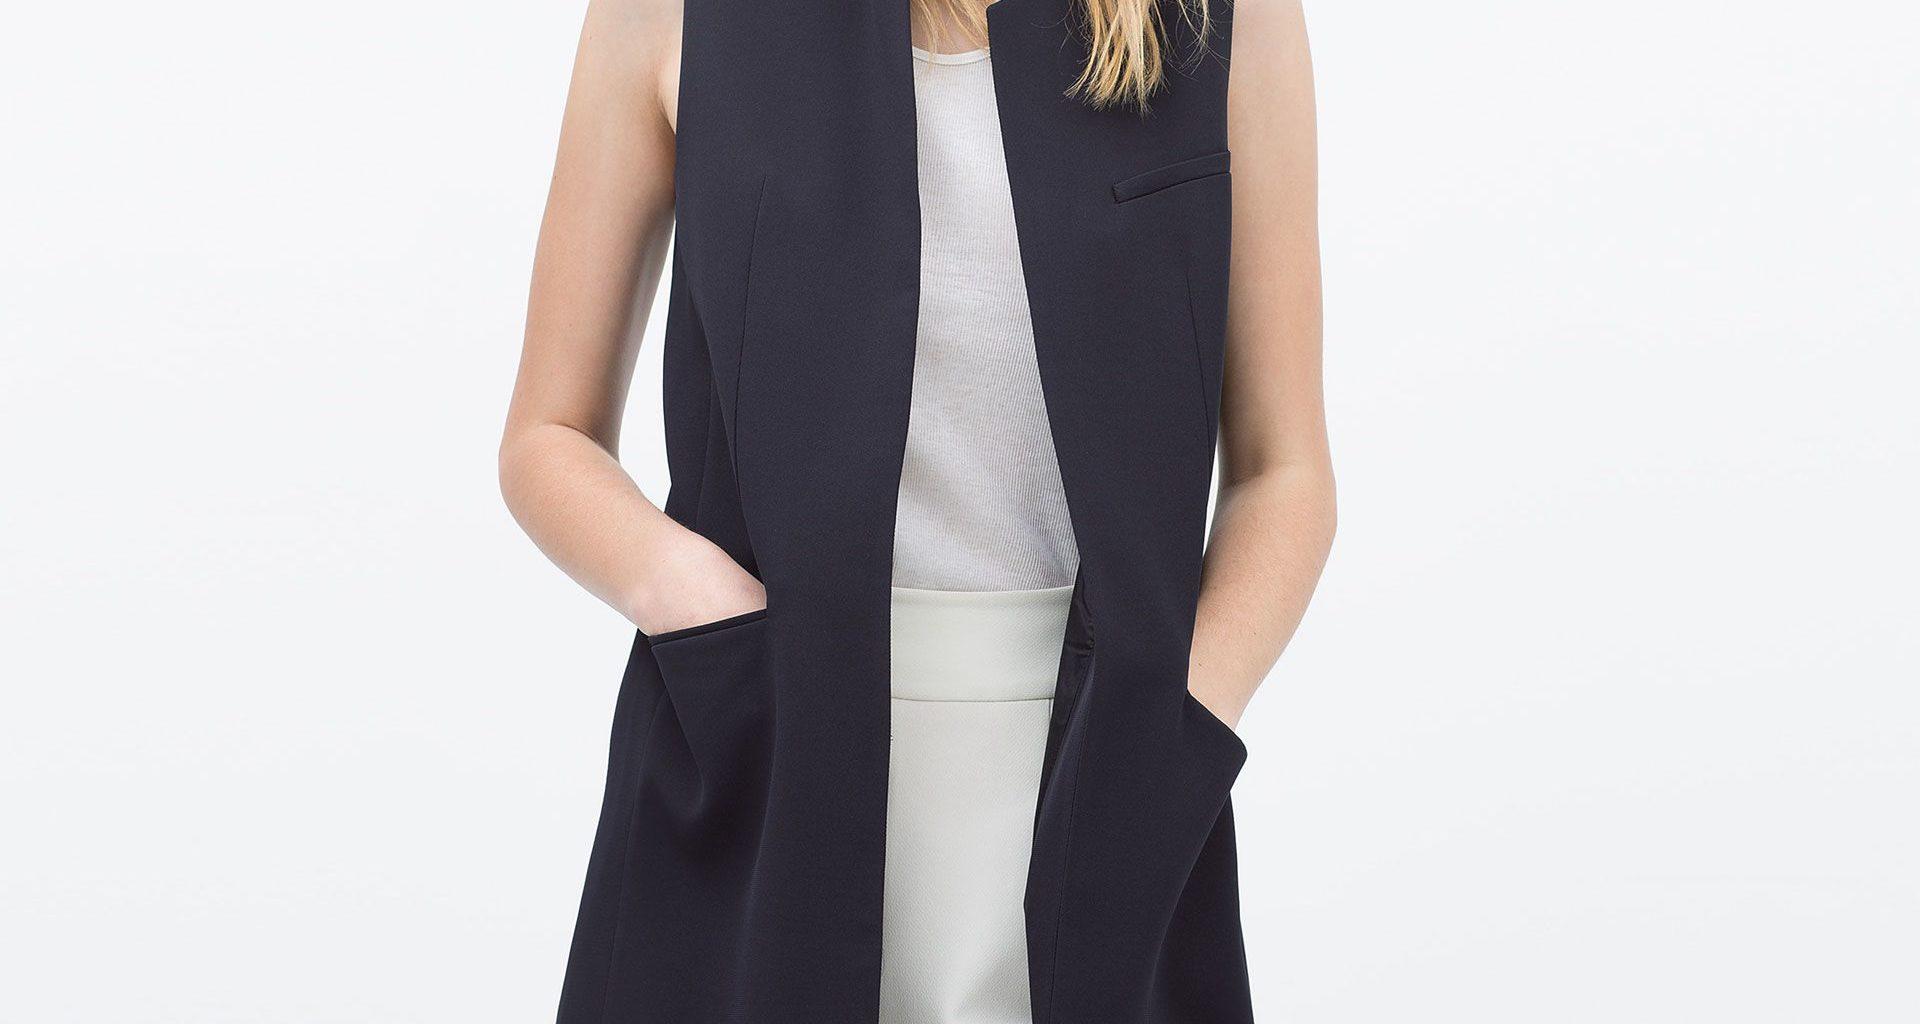 Hot Tips for Wearing a Sleeveless Blazer